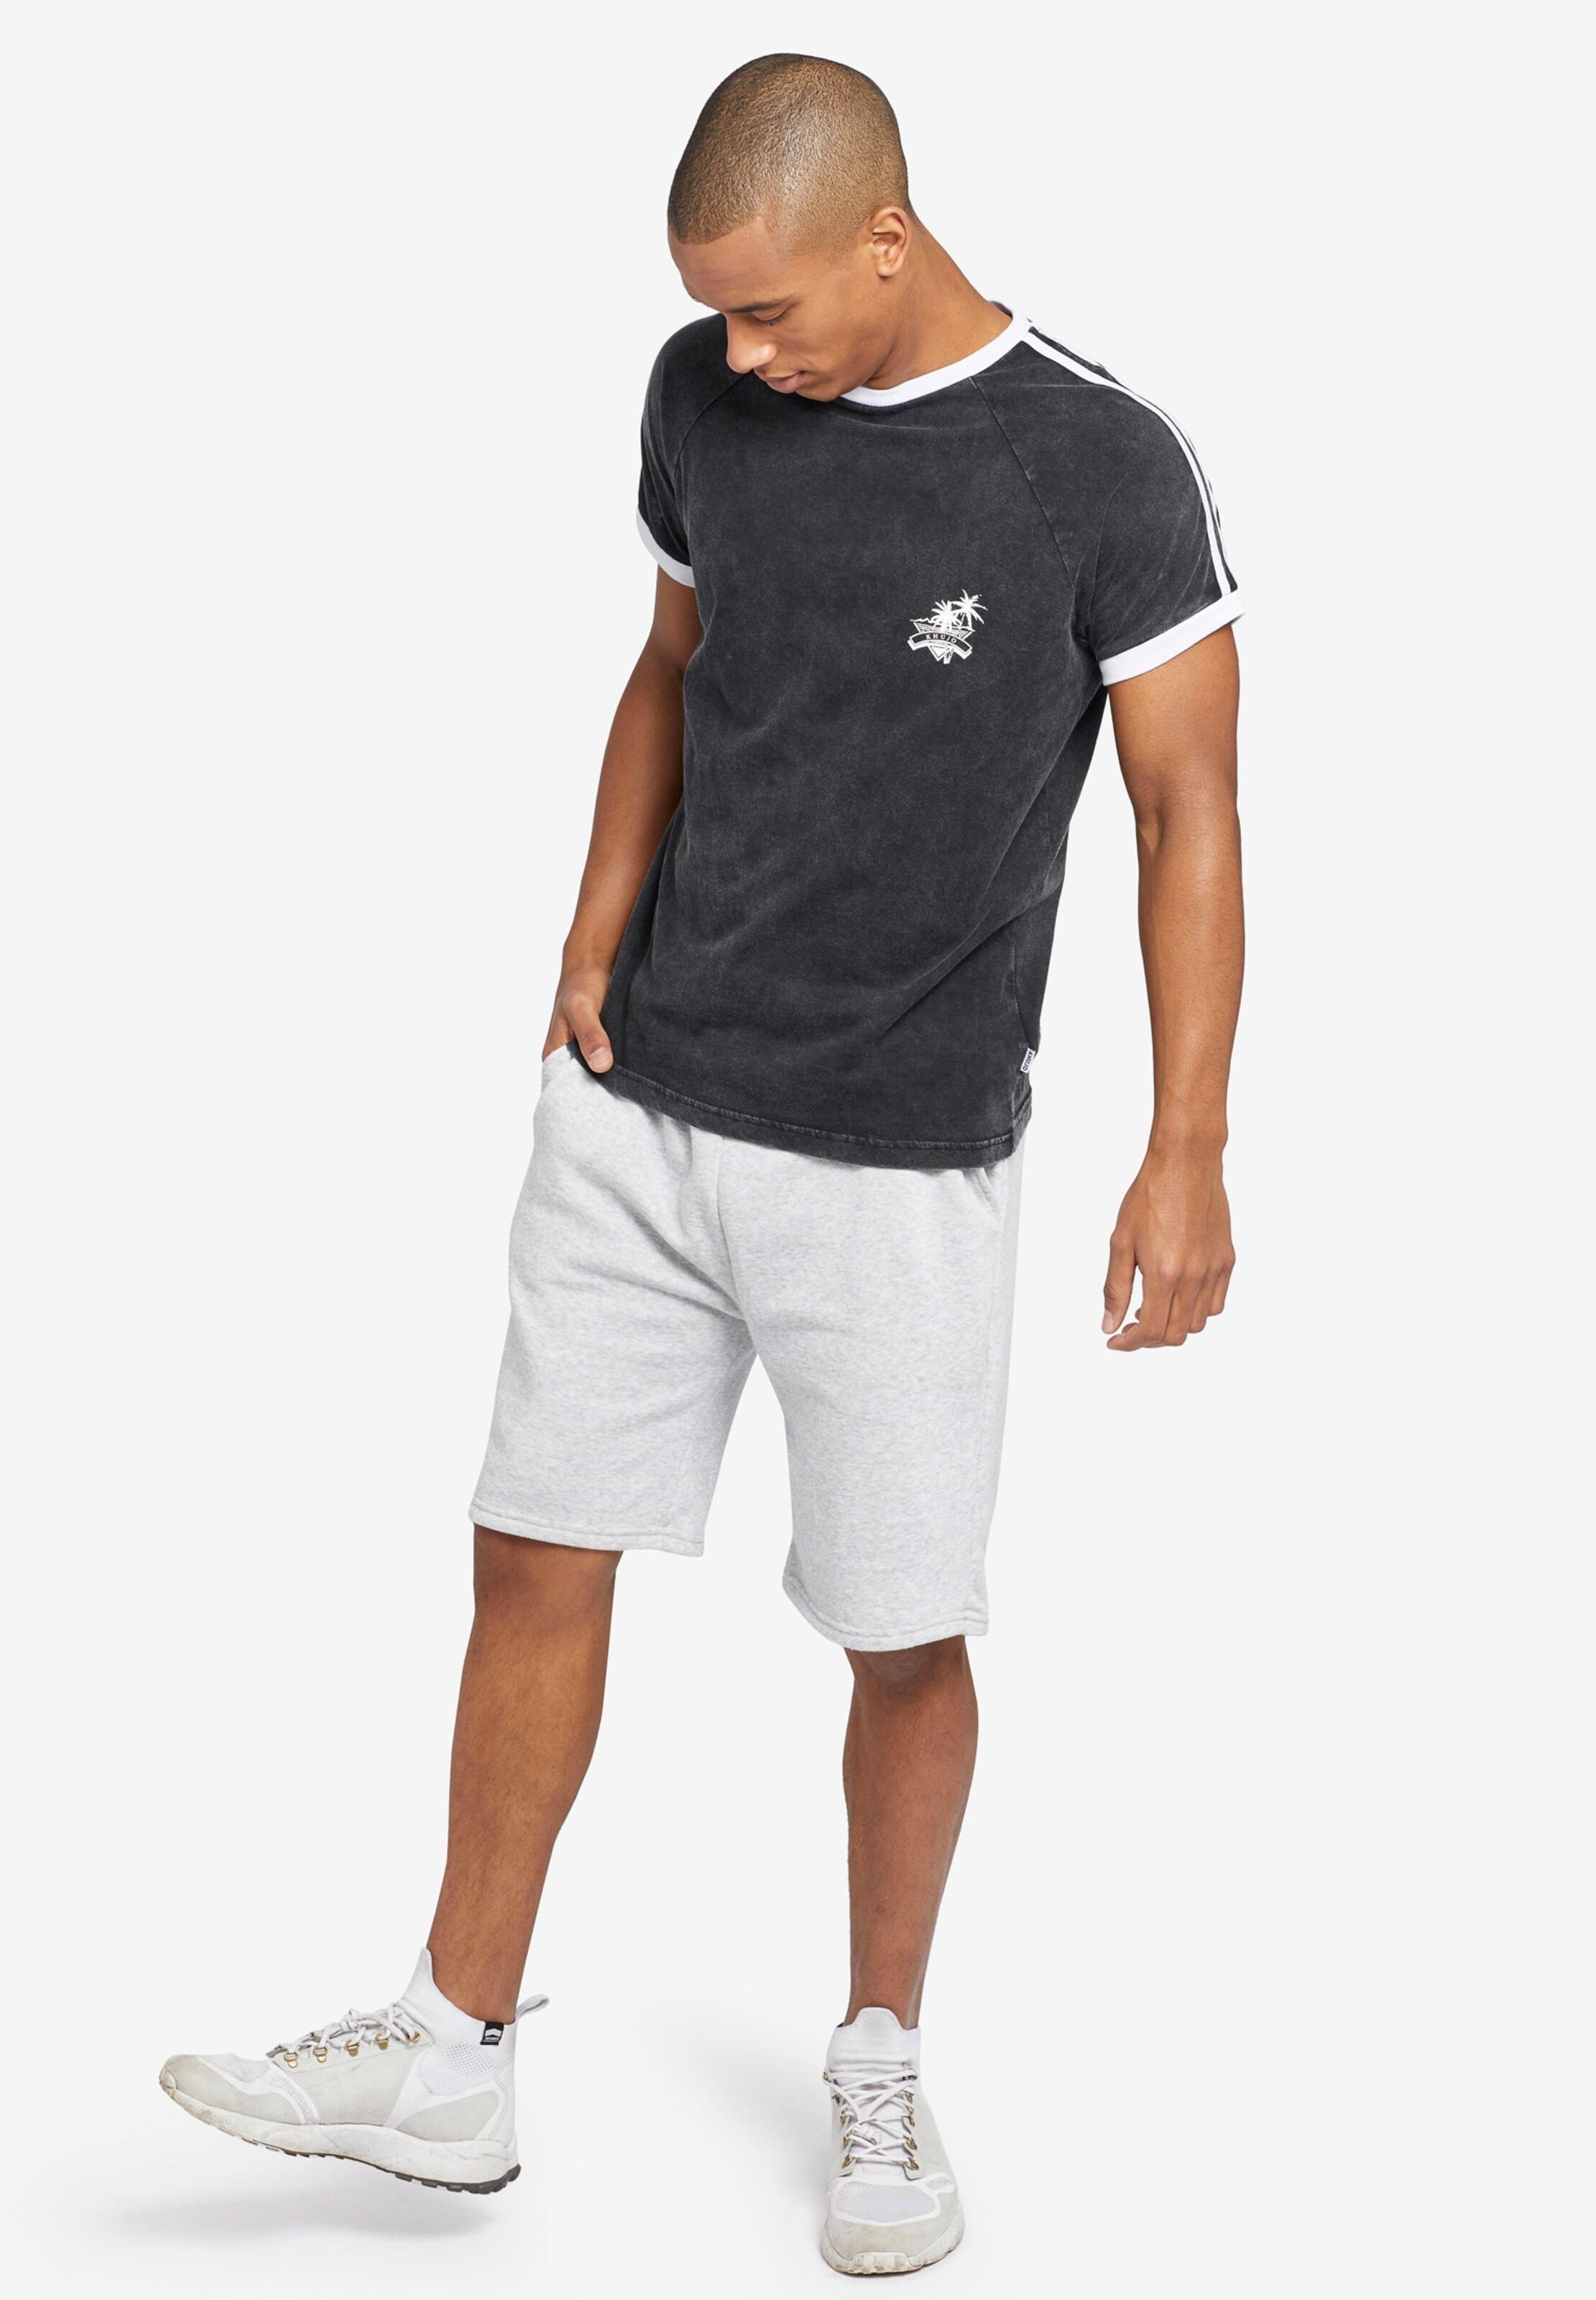 Khujo shirt NoirBlanc 'justus' En T 8wnymvON0